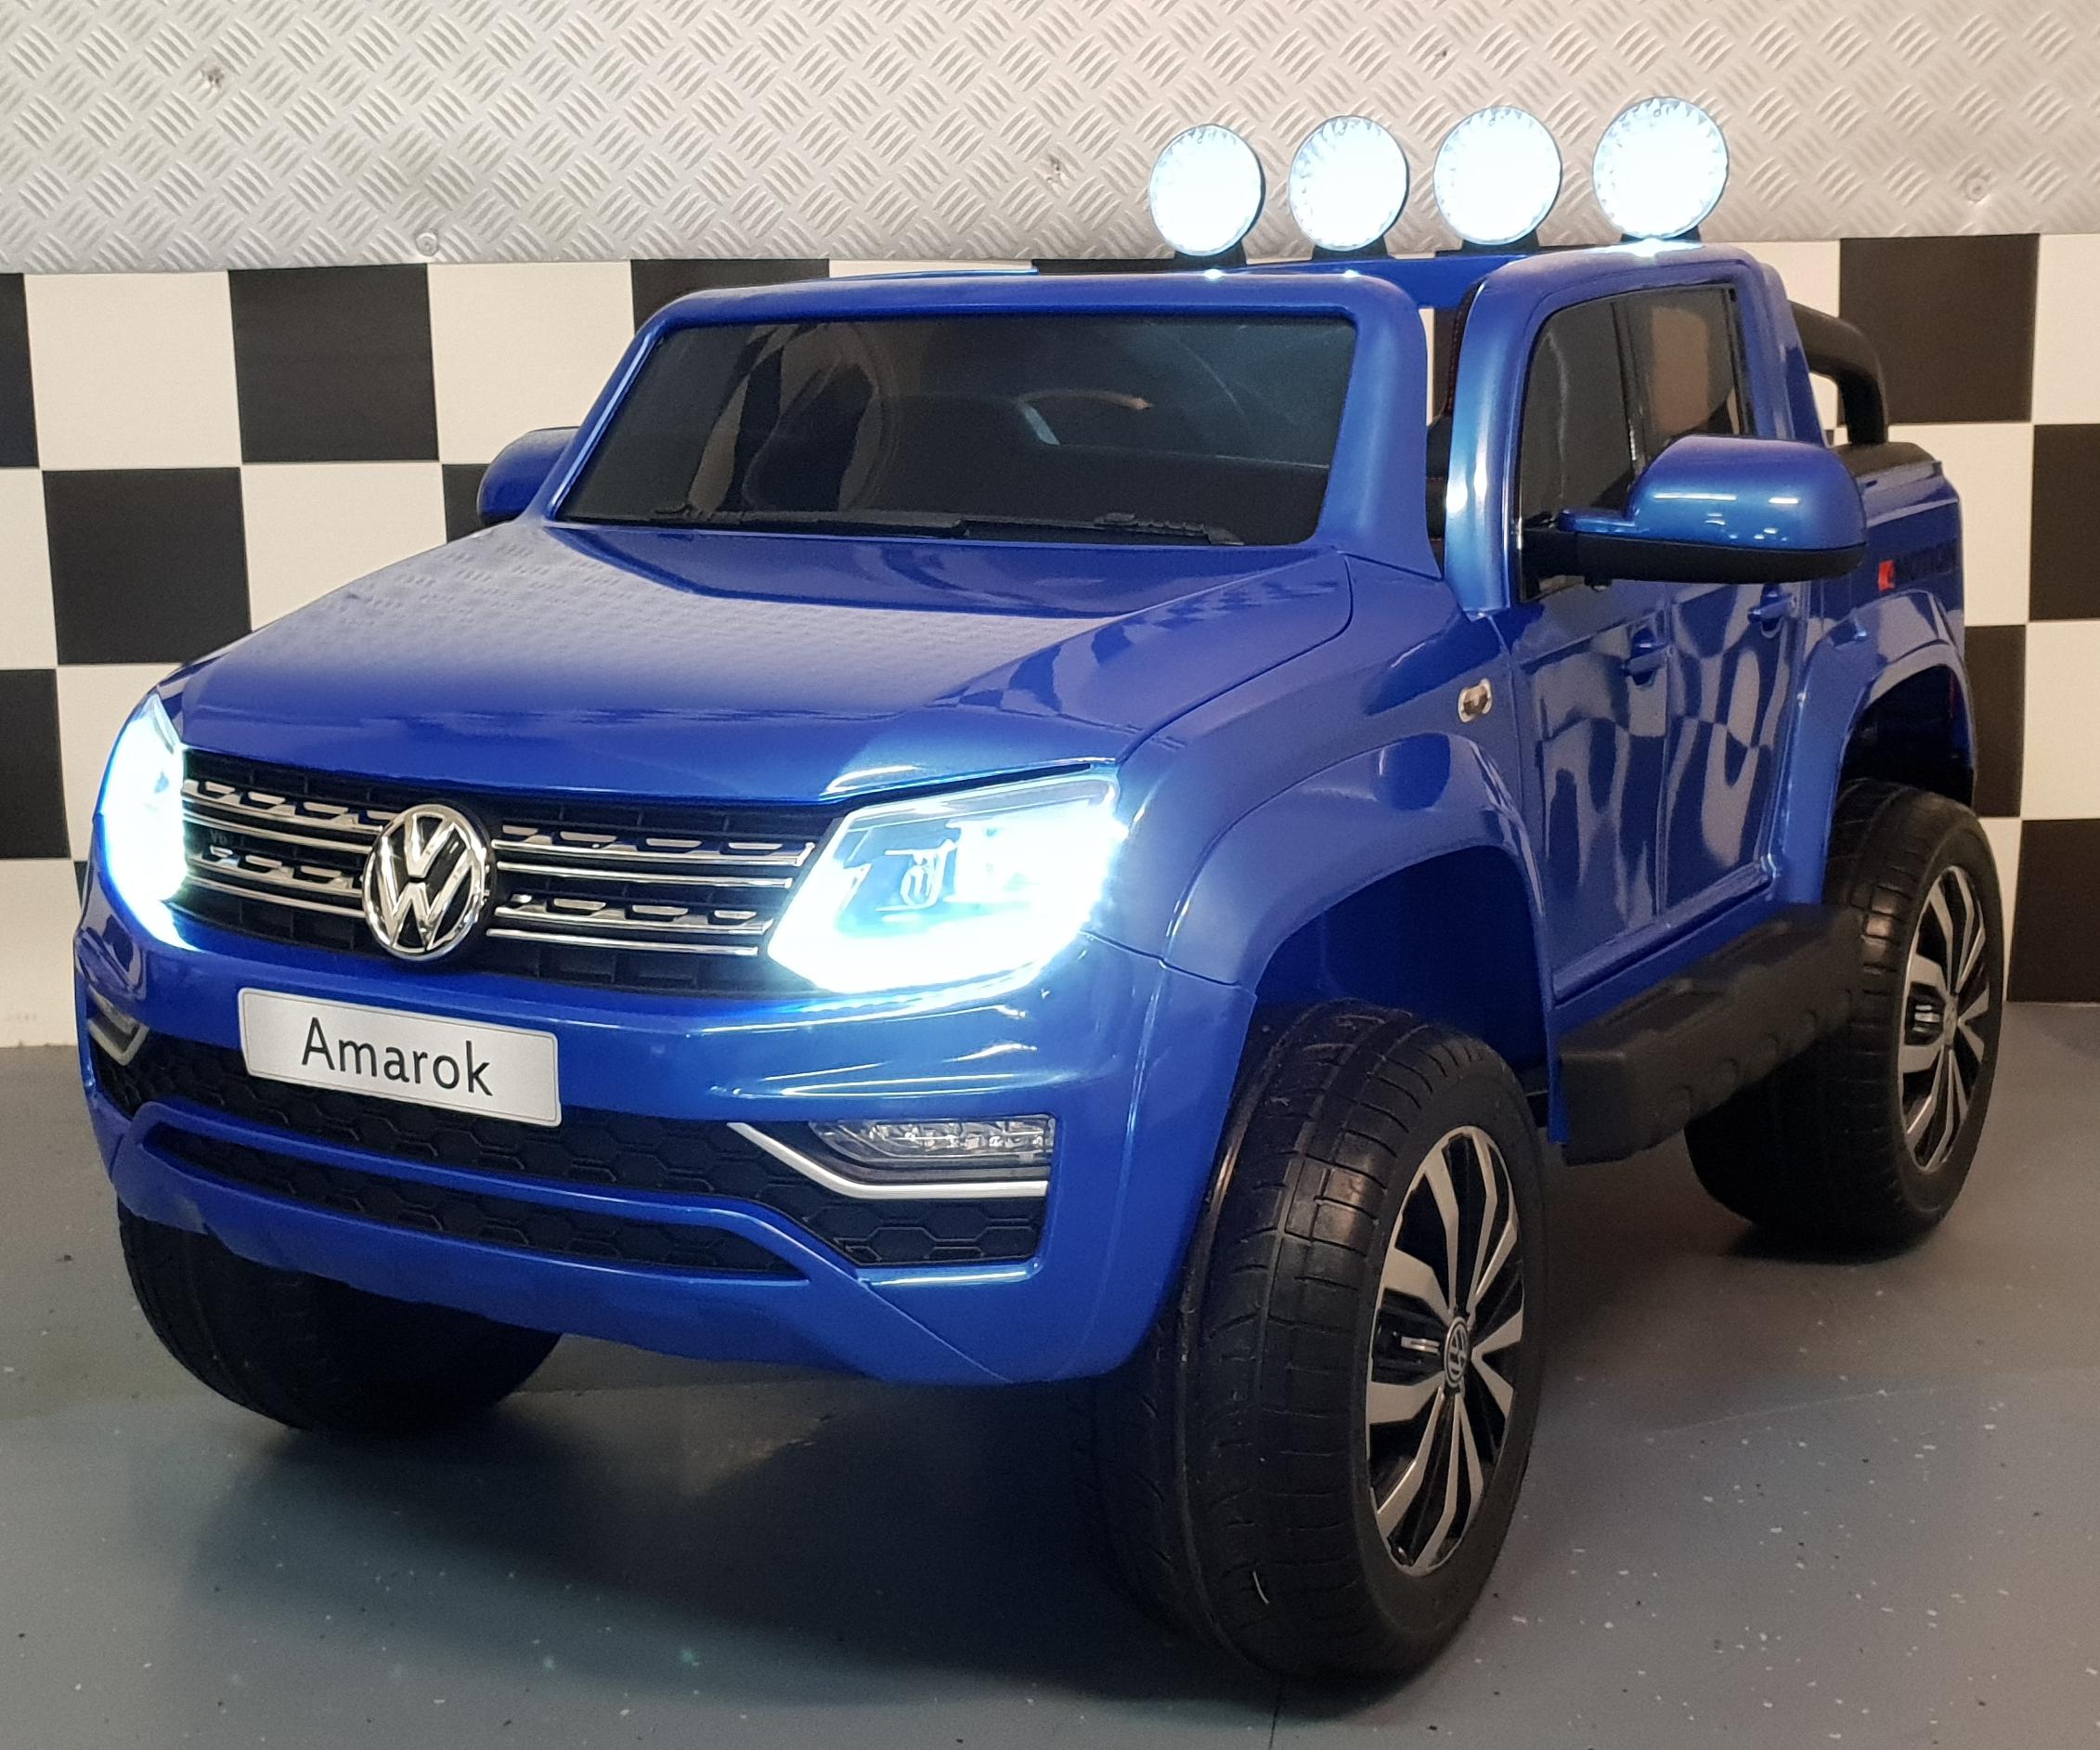 VW Amarok kinderauto 2x12V 2.4G RC 4WD metallic blauw